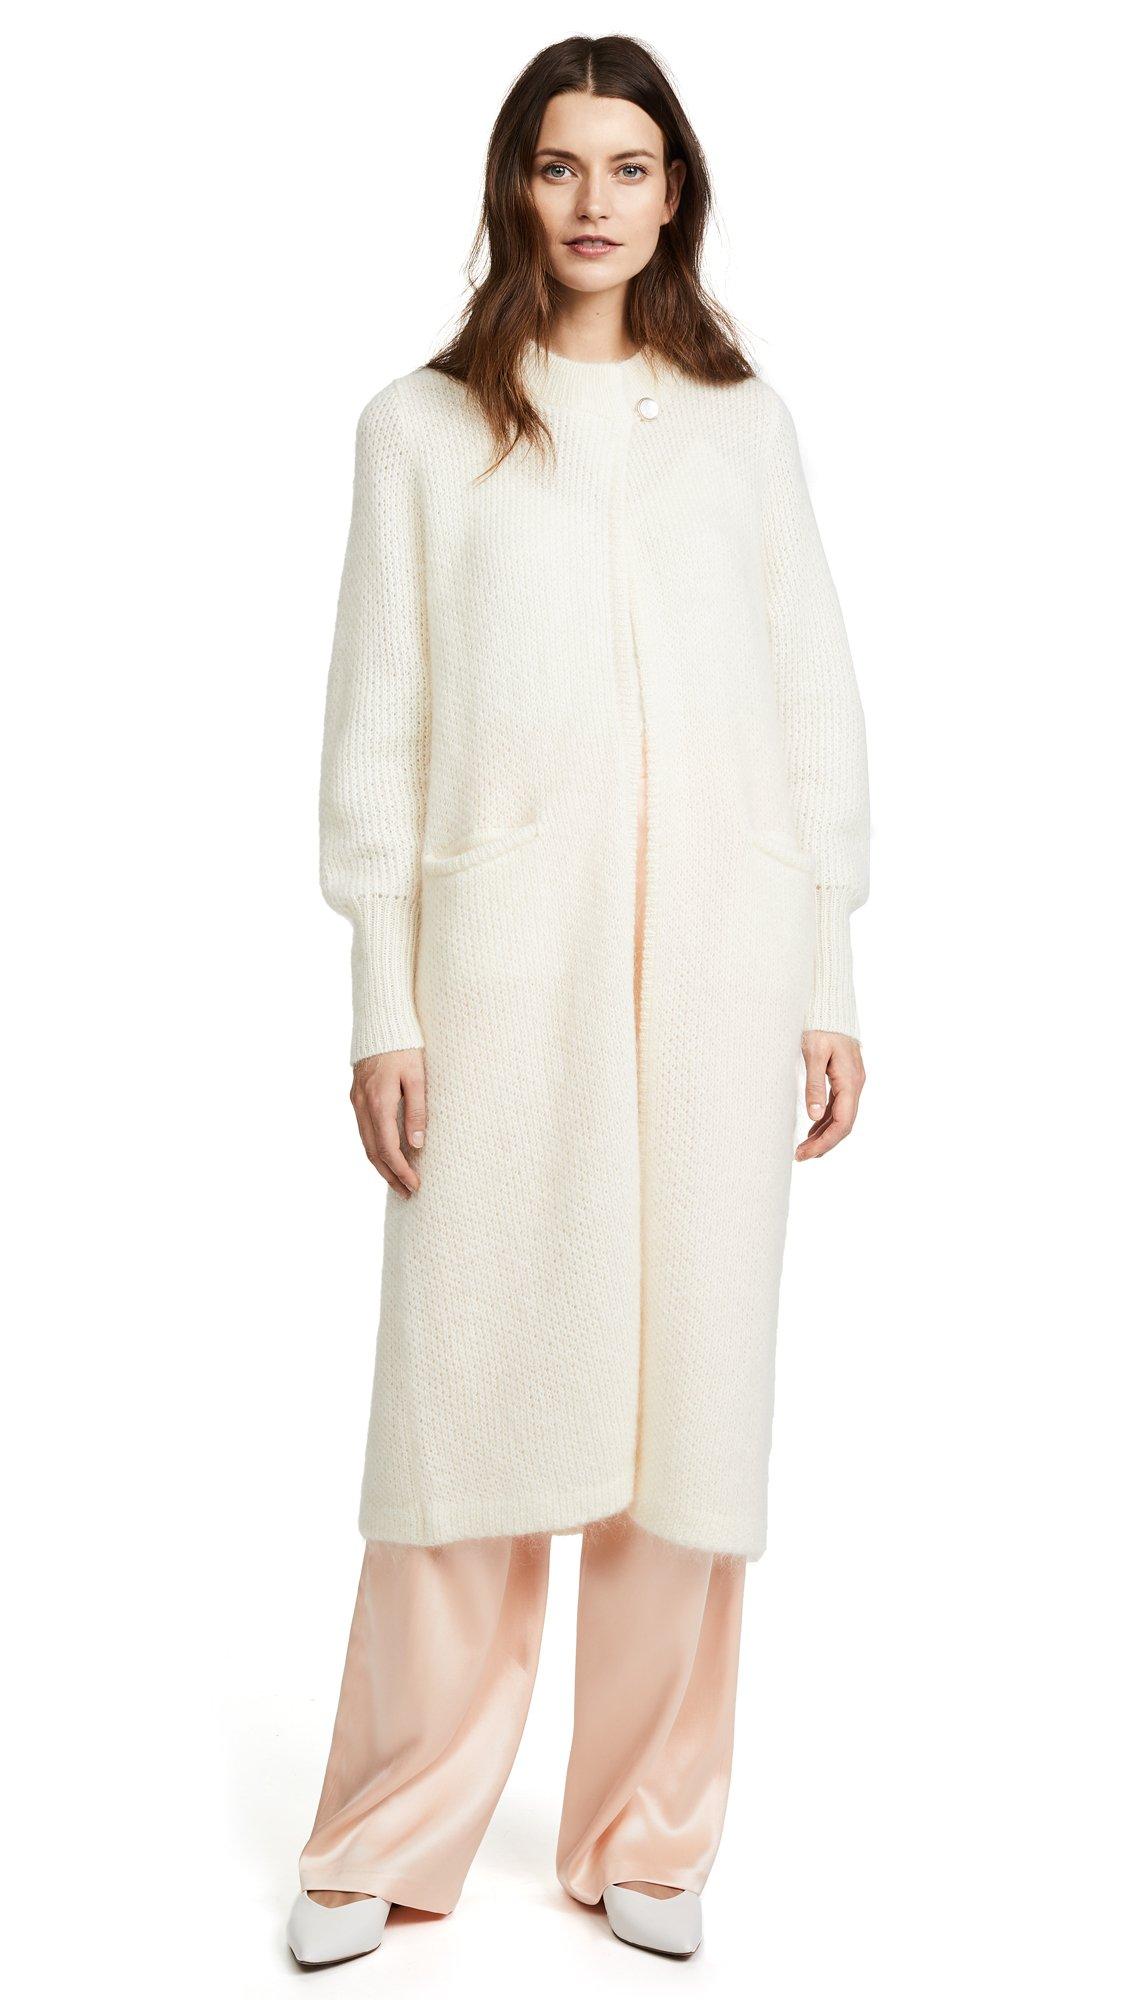 TEMPERLEY London Women's Dawn Knit Cocoon Coat, Ivory, X-Large